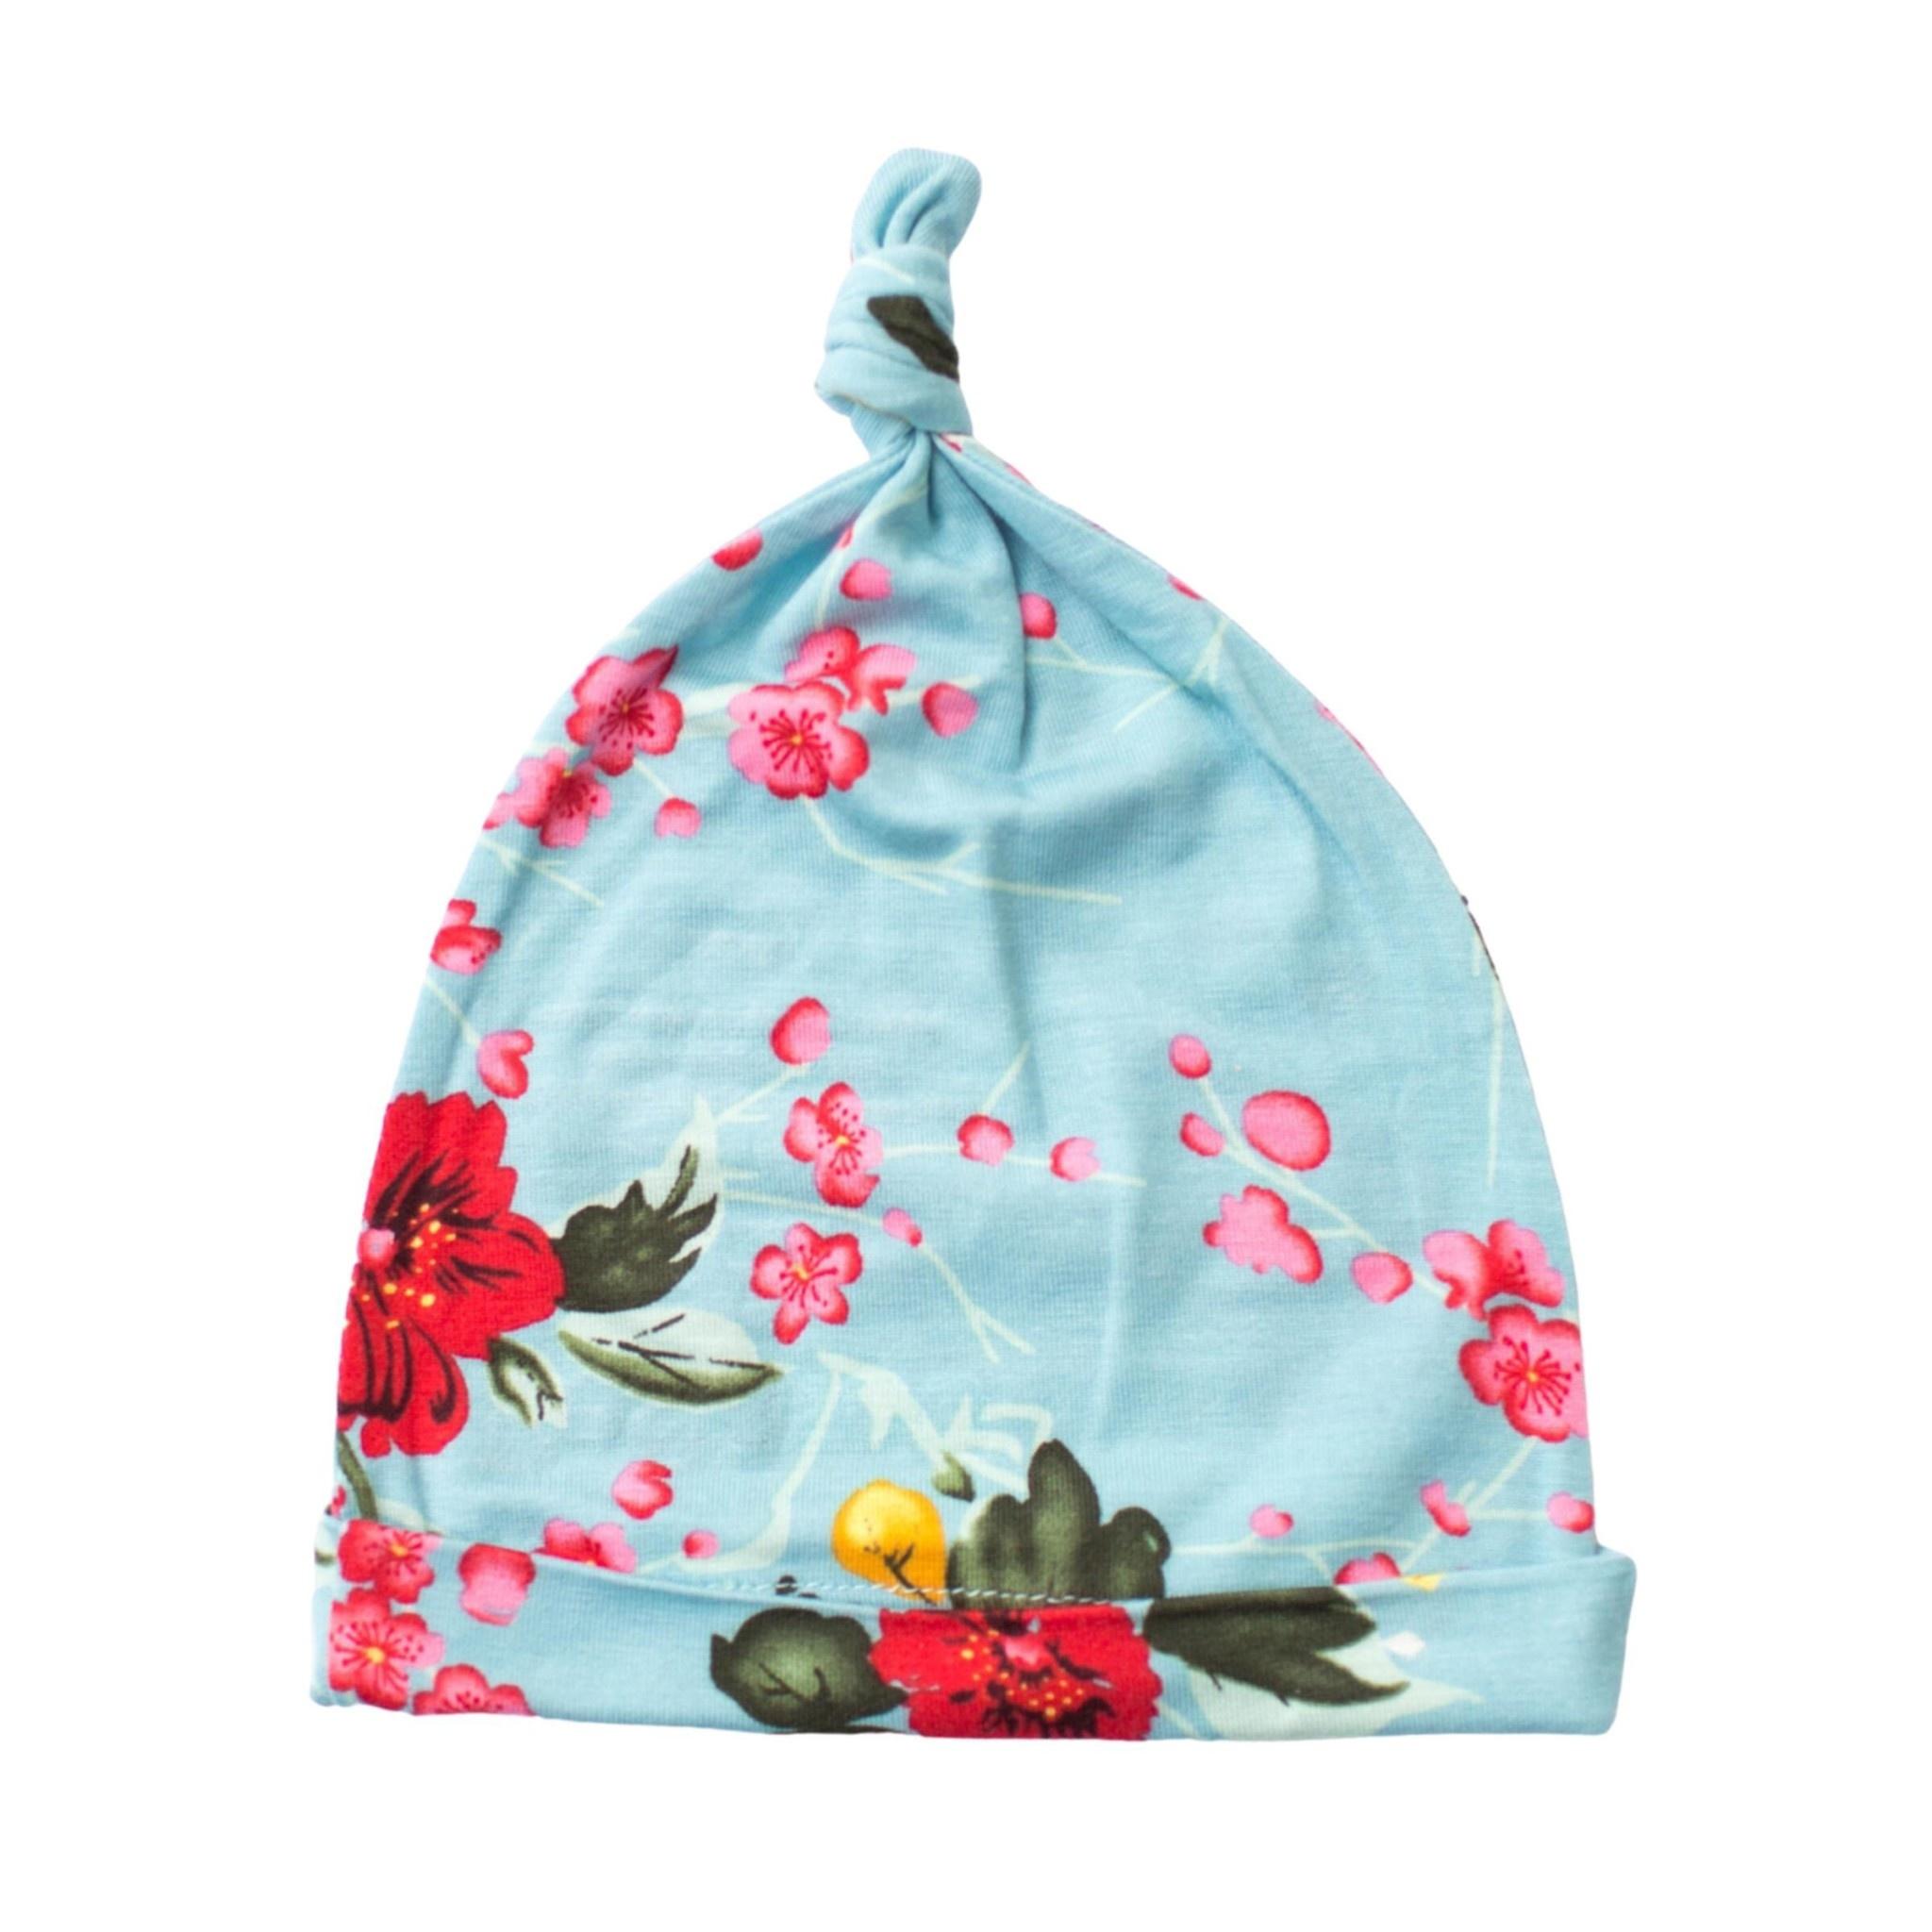 Bestaroo Cherry Blossom Hat - Teal 0-3m